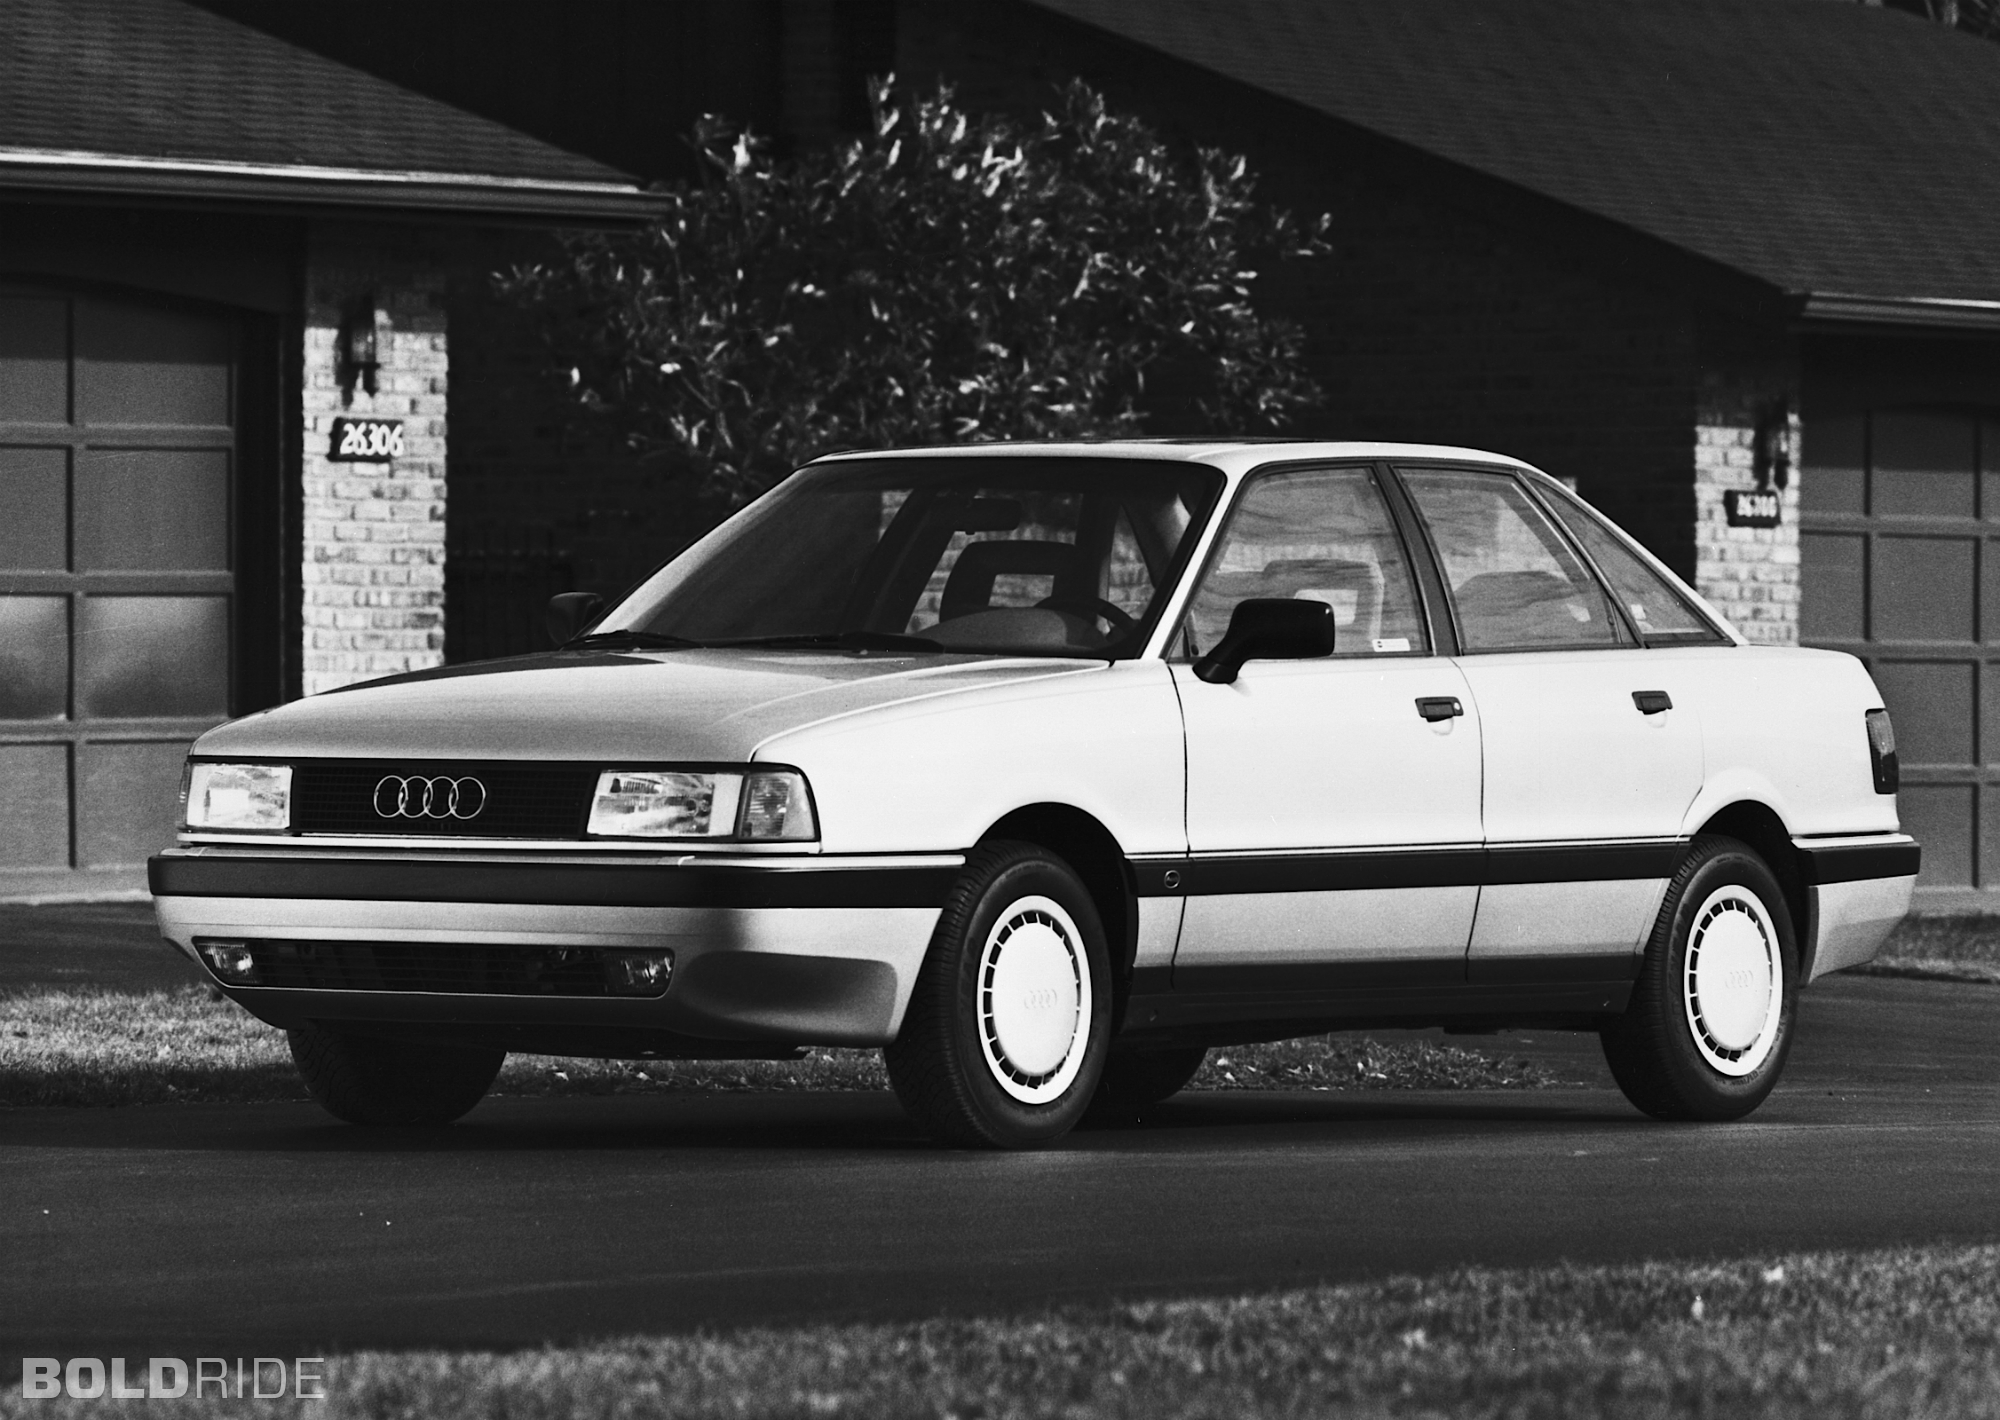 1992 Audi 80 Image 3